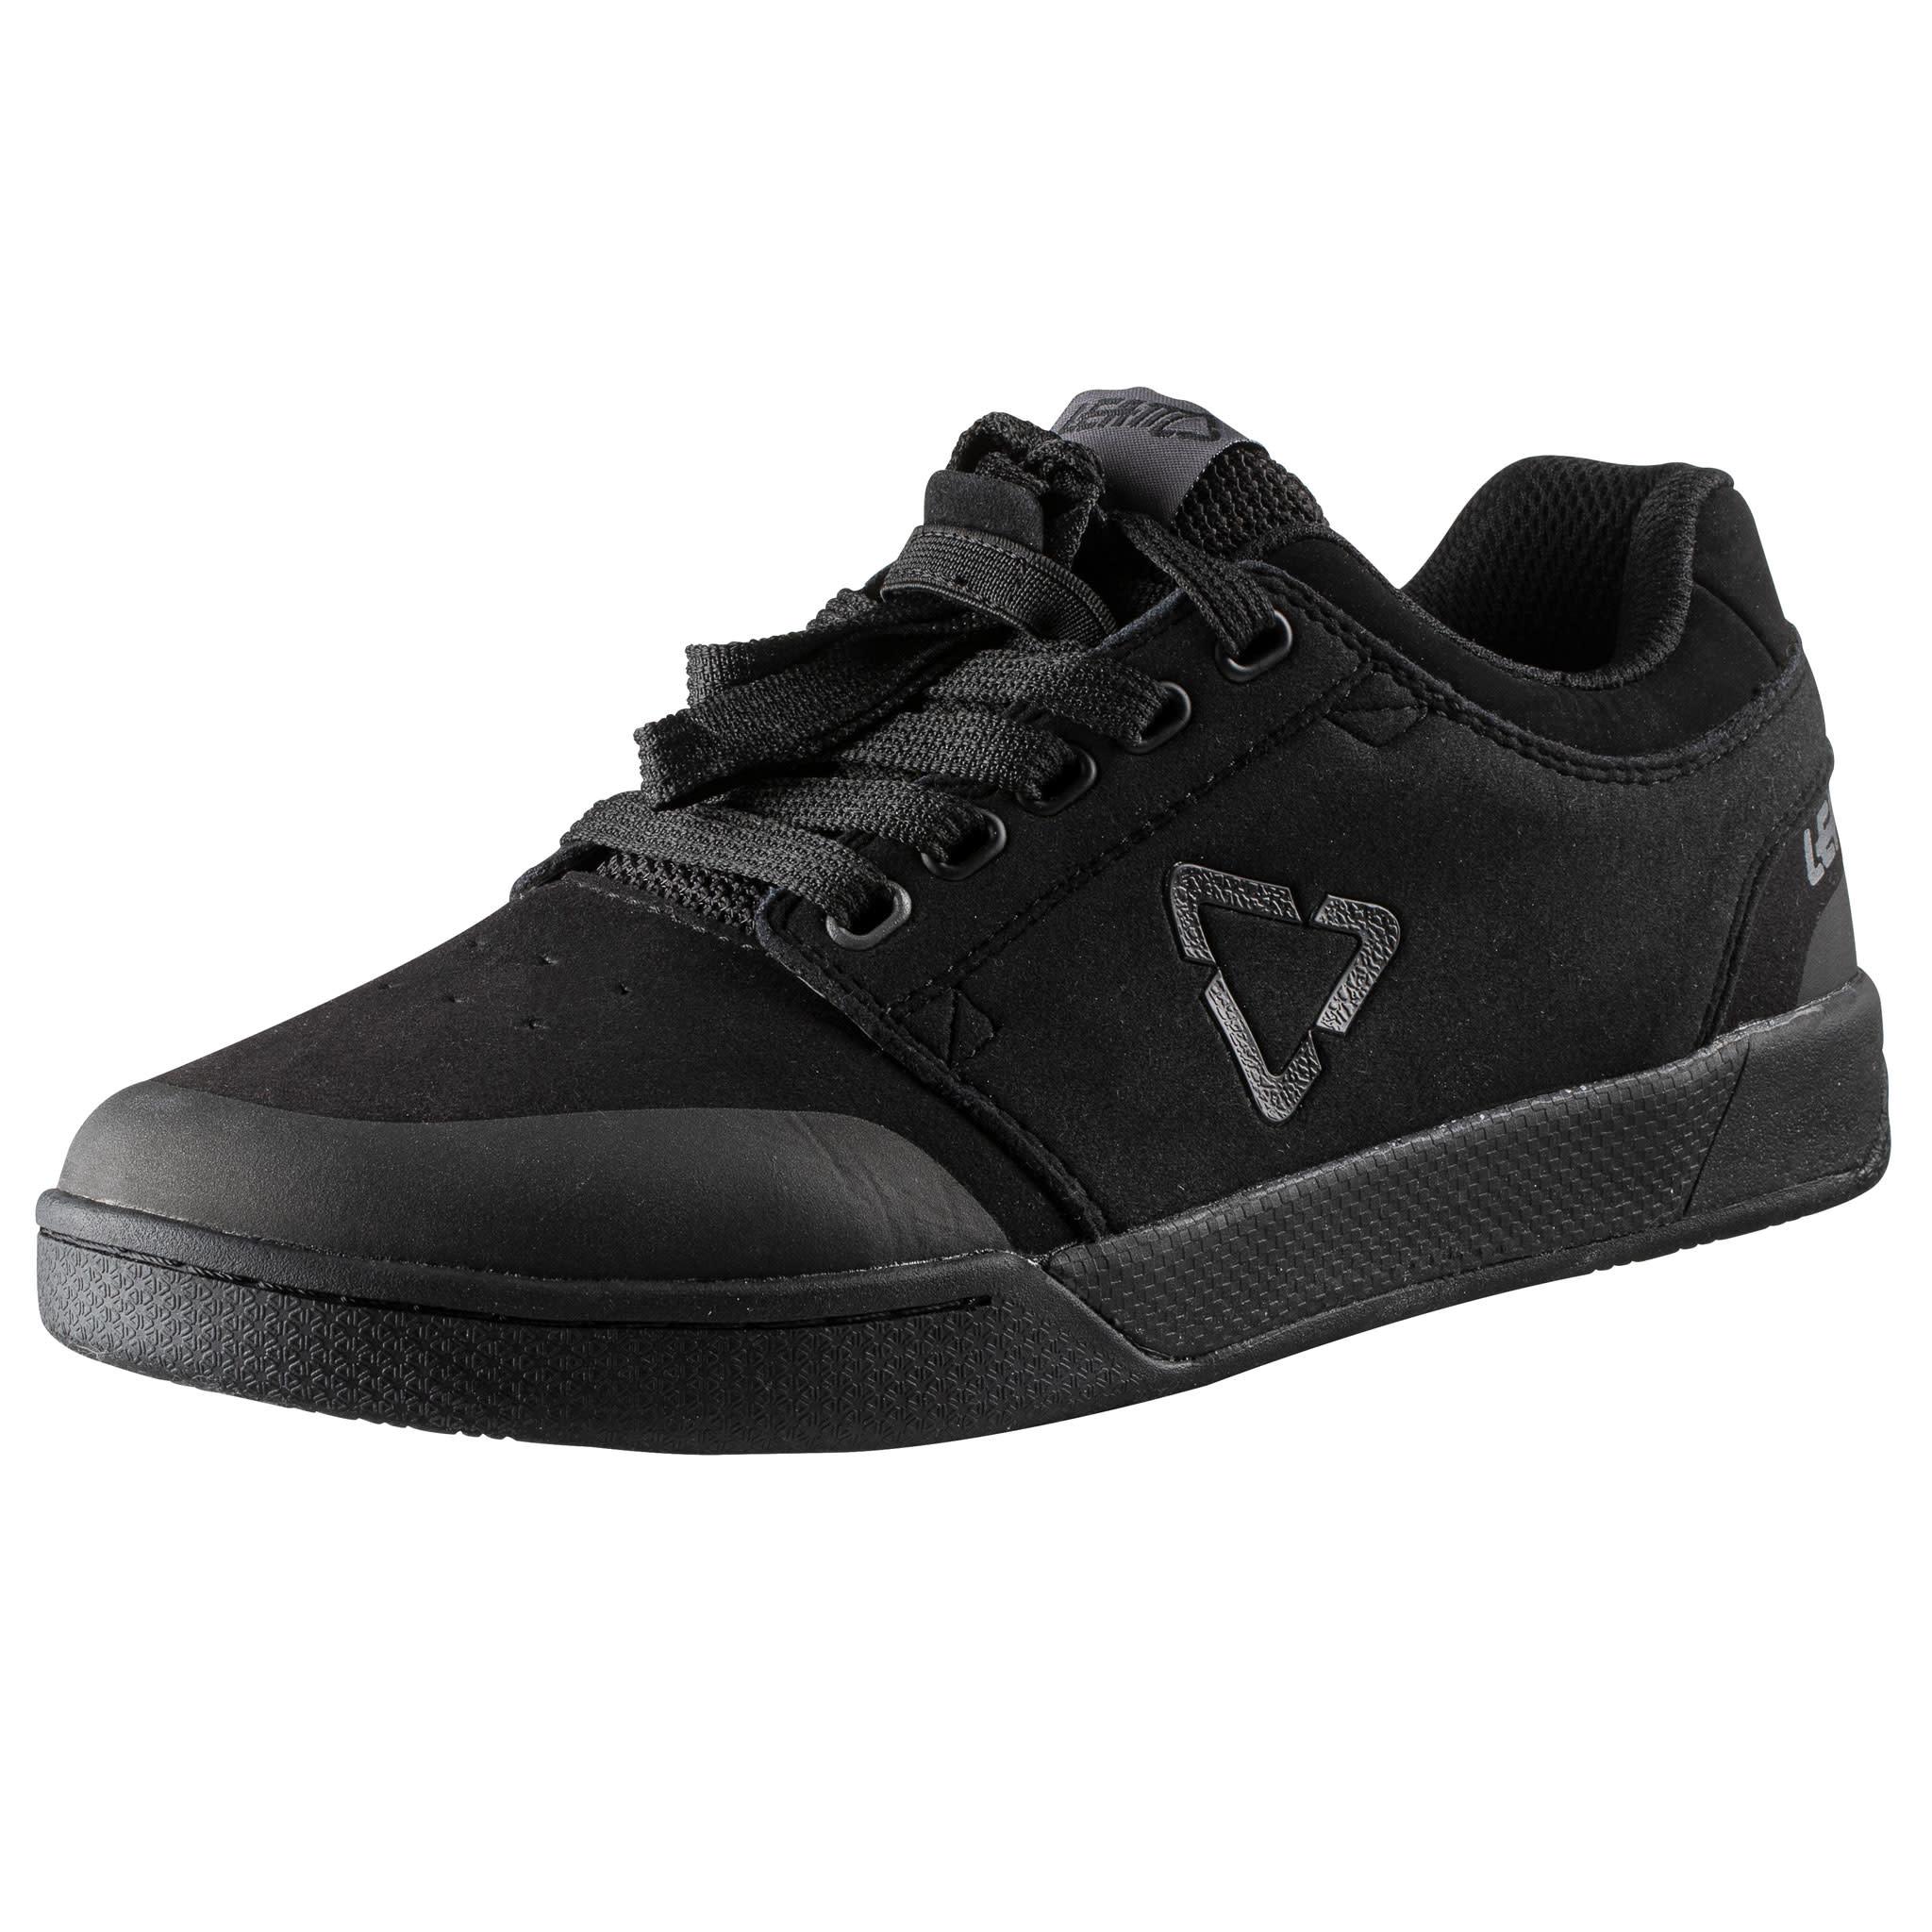 Leatt Leatt, DBX 2.0 Shoes, Black - 10.5